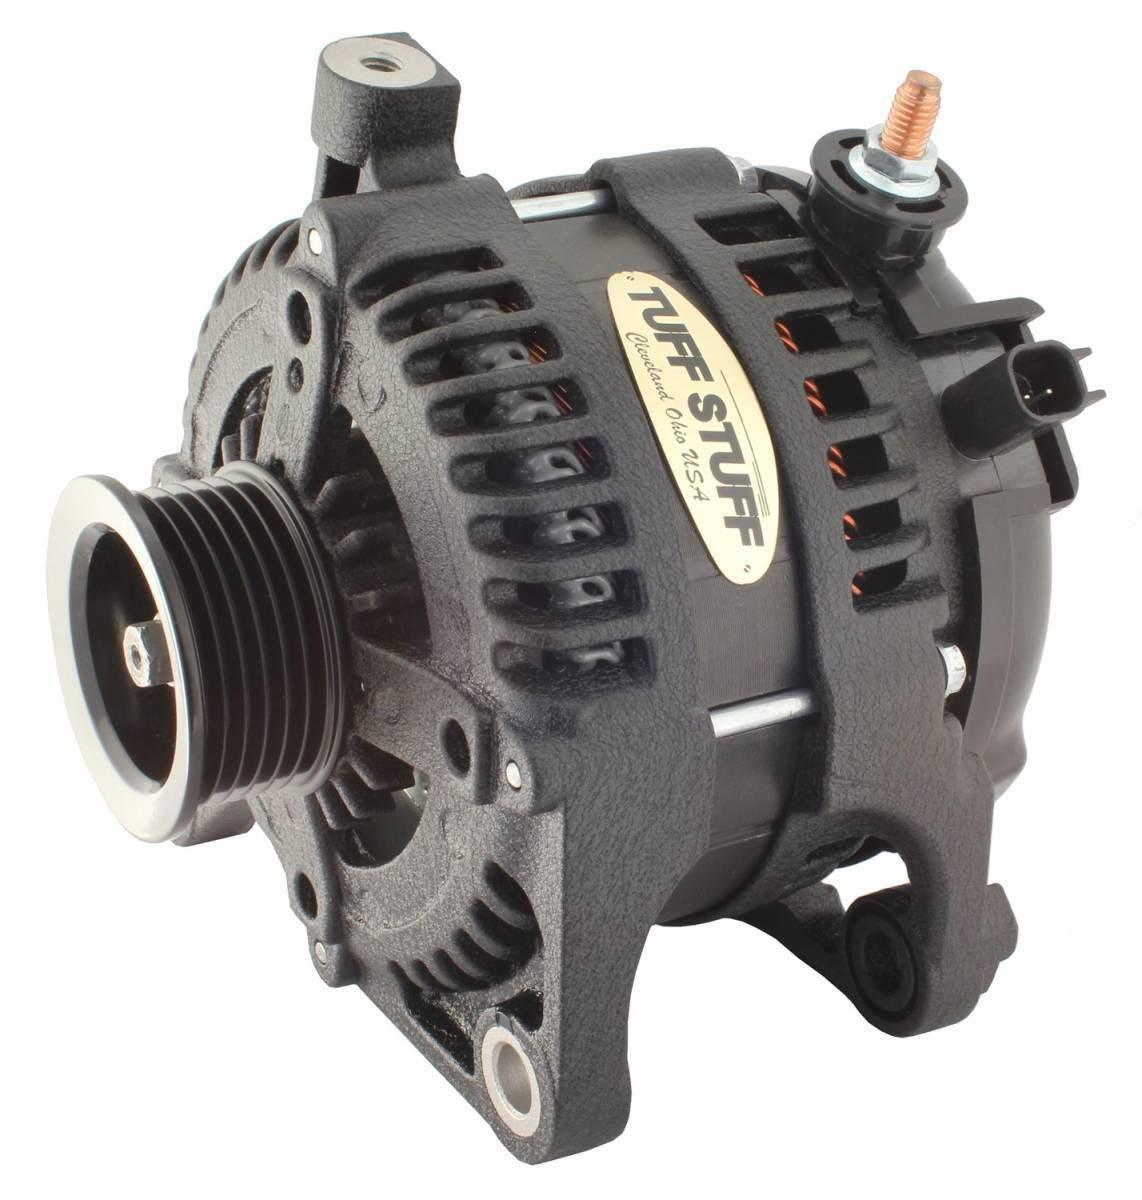 Tuff-Stuff 7513B Alternator, 175 amp, 12V, External Regulator, 6 Rib Serpentine Pulley, Black Wrinkle, Jeep Wrangler JK 2007-11, Each